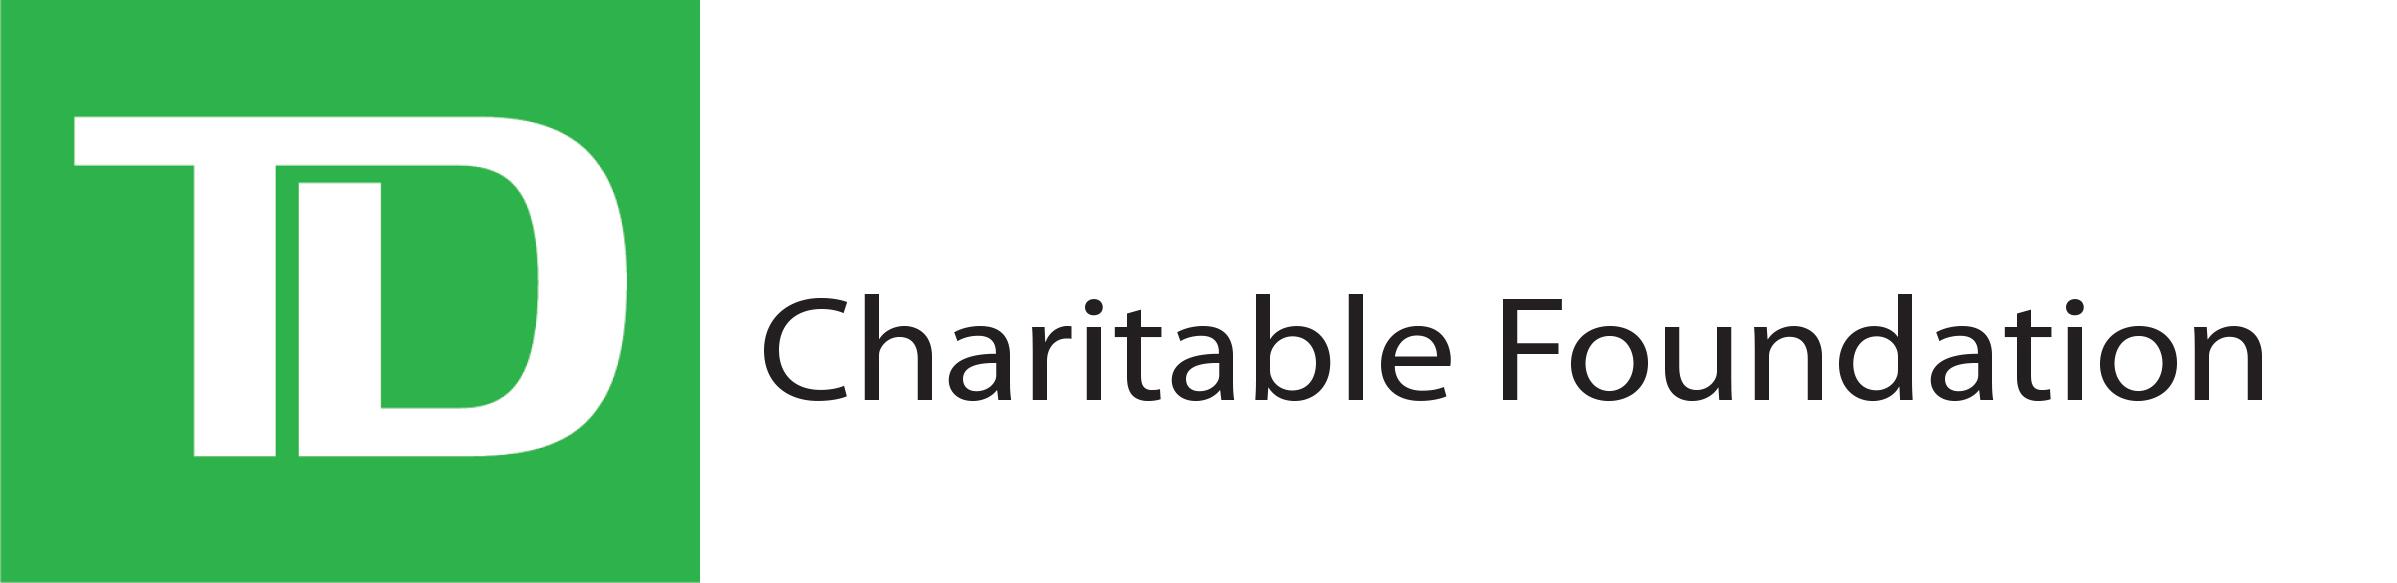 TD_CharitableFoundation-logo-resized3-1.jpg